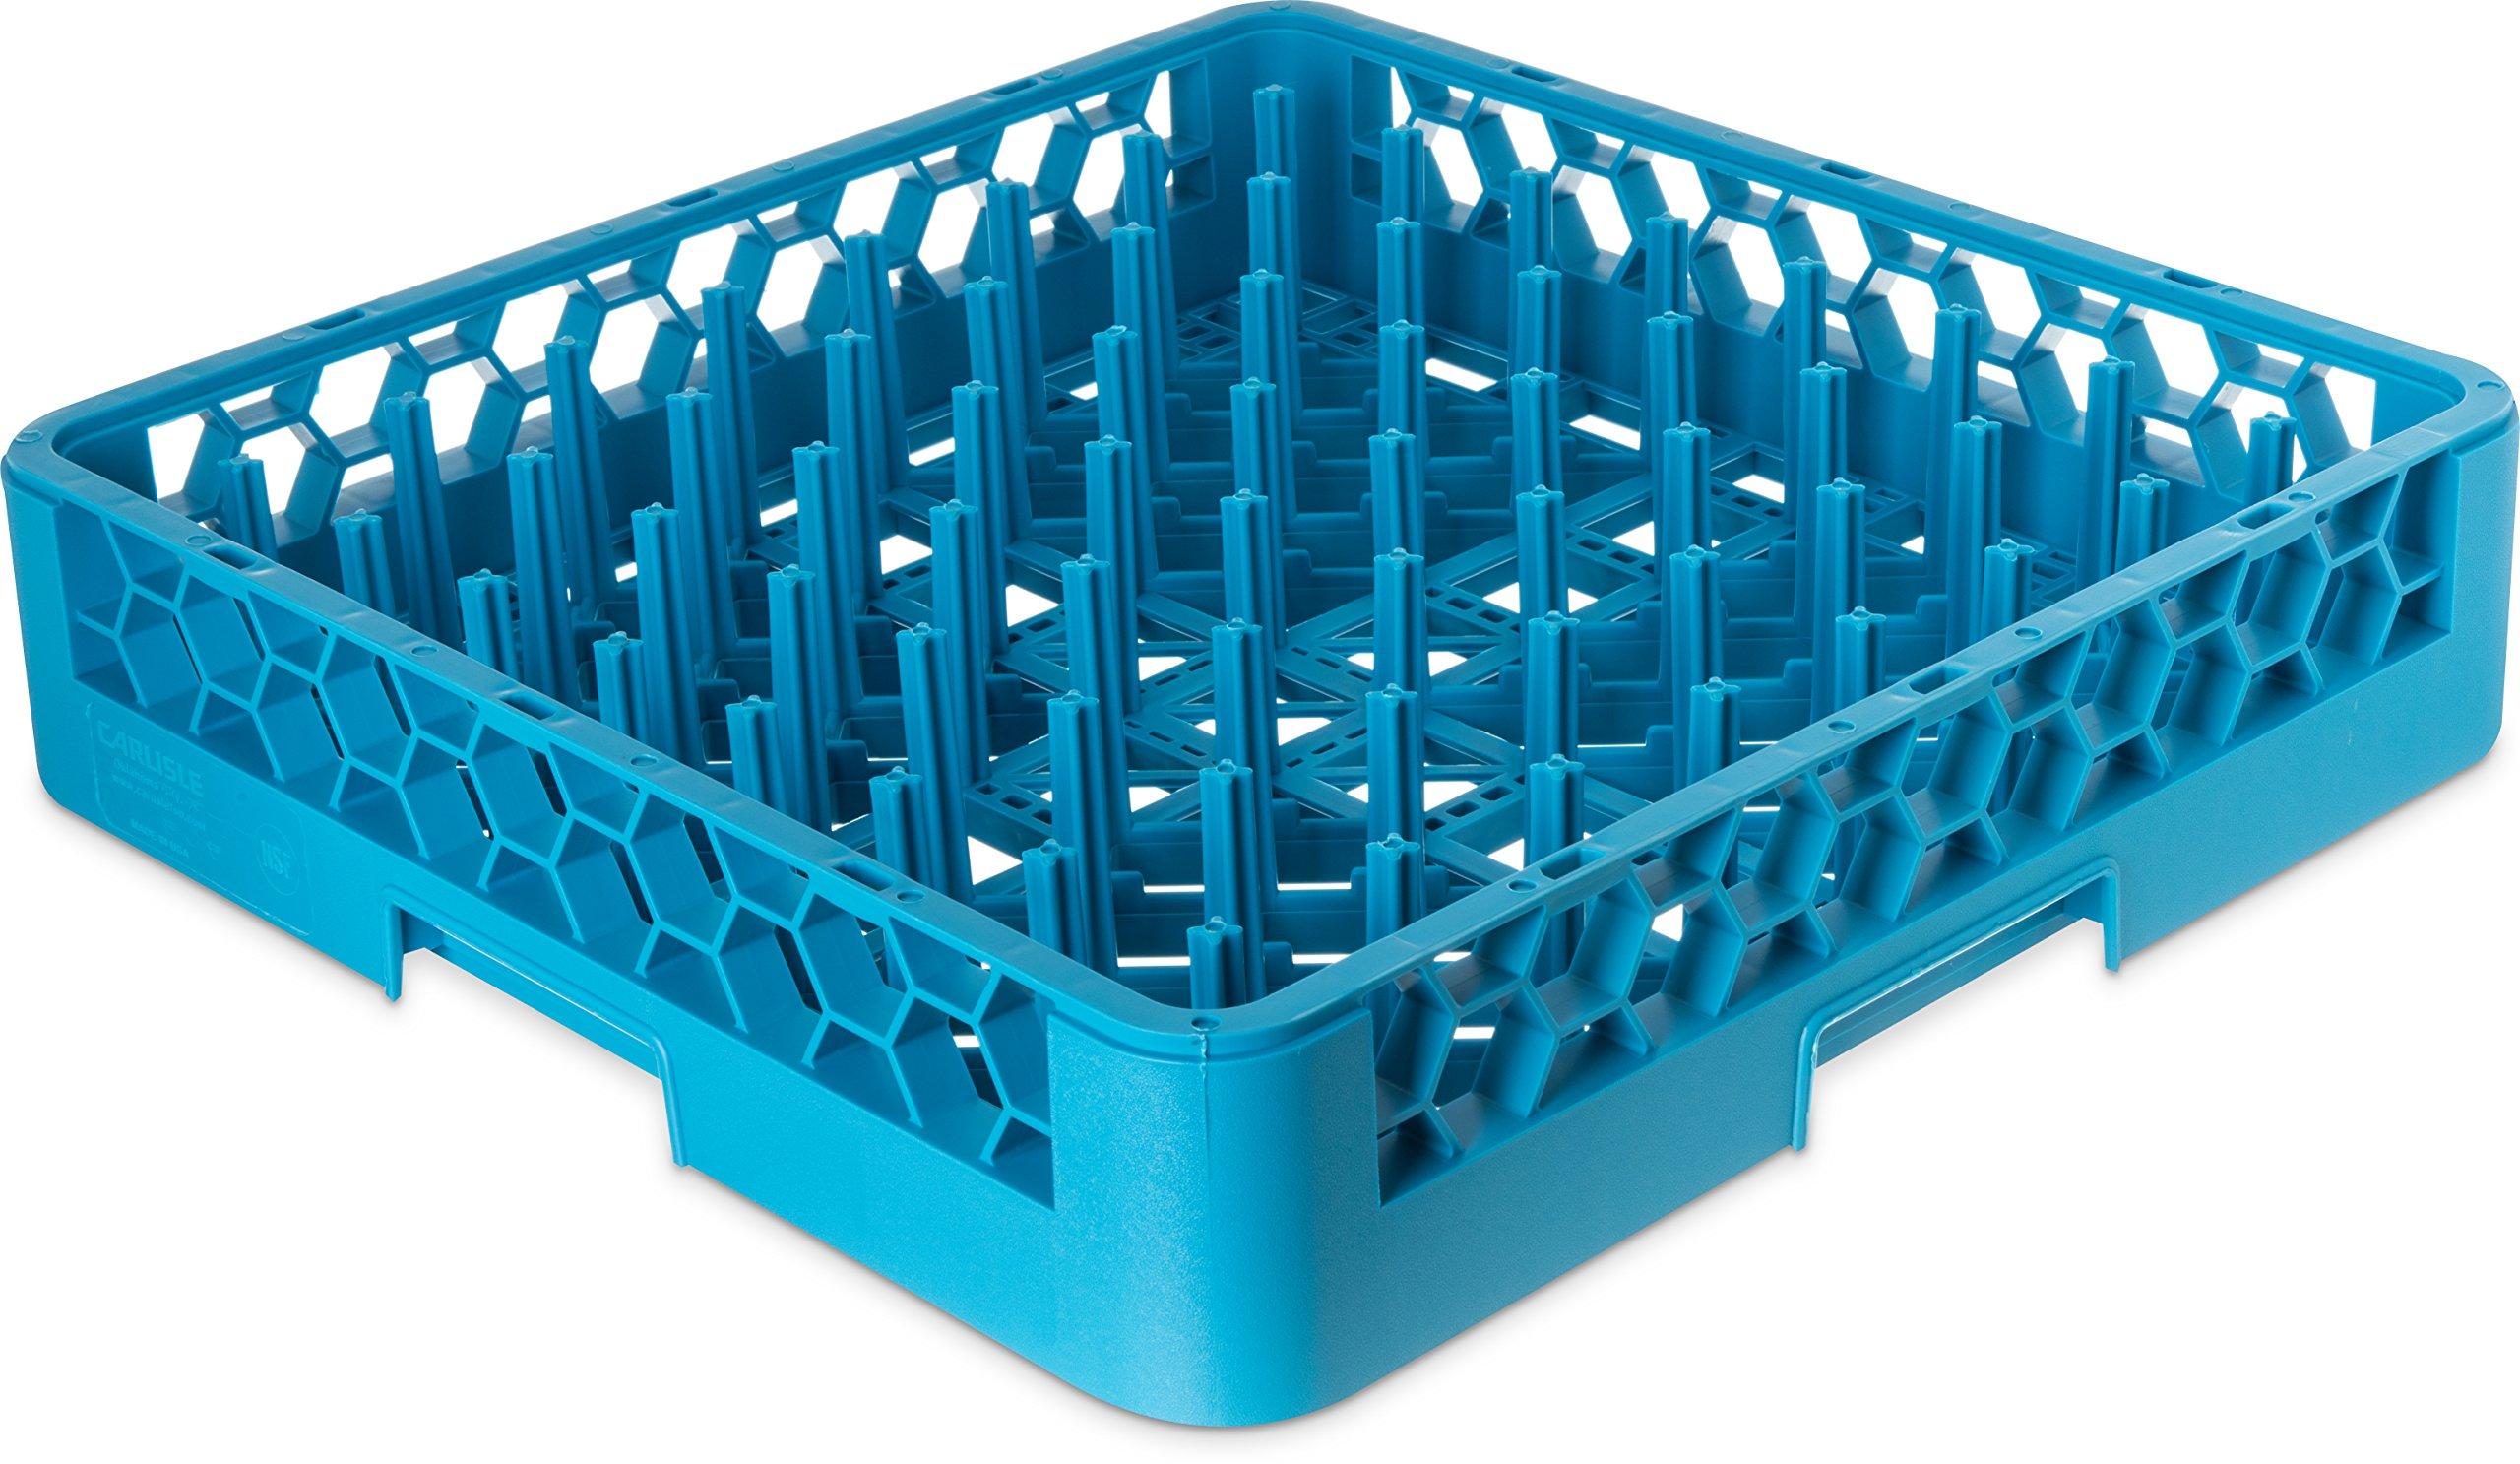 Carlisle RTP14 OptiClean Tall Peg Plate Rack, Blue (Pack of 6) by Carlisle